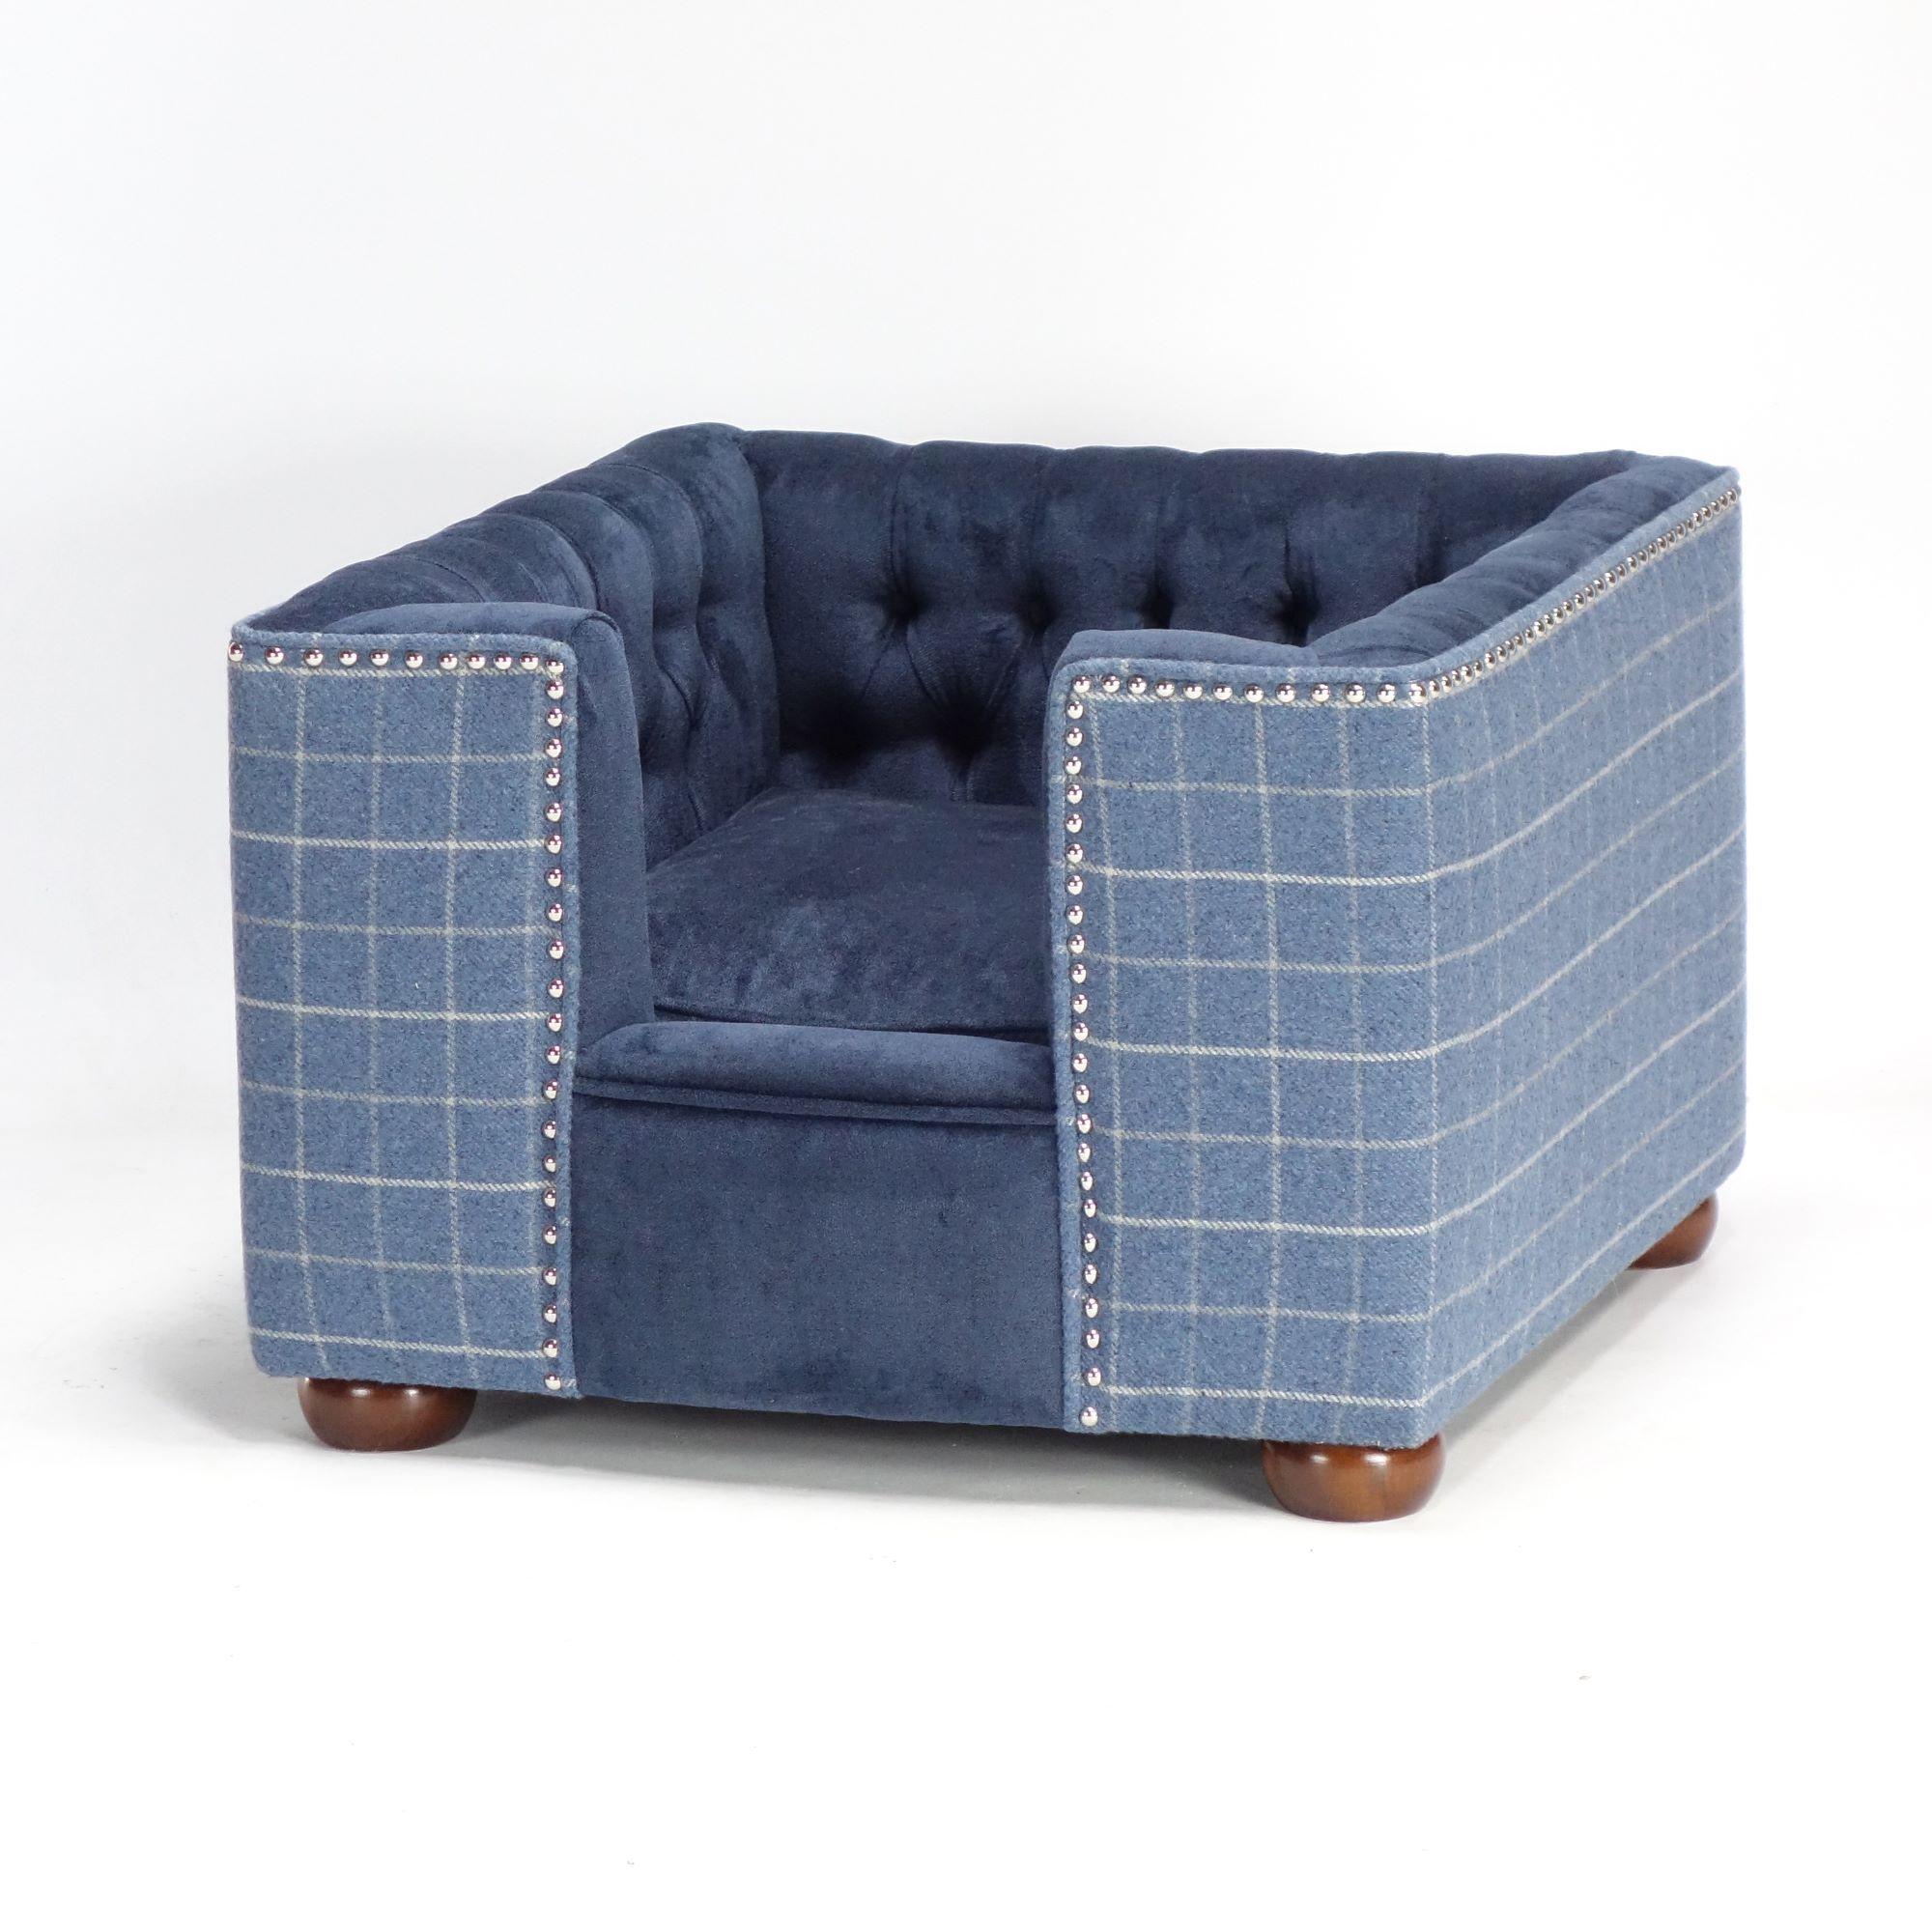 Stylish handmade dog bed chesterfield sofa Hampton pet bed